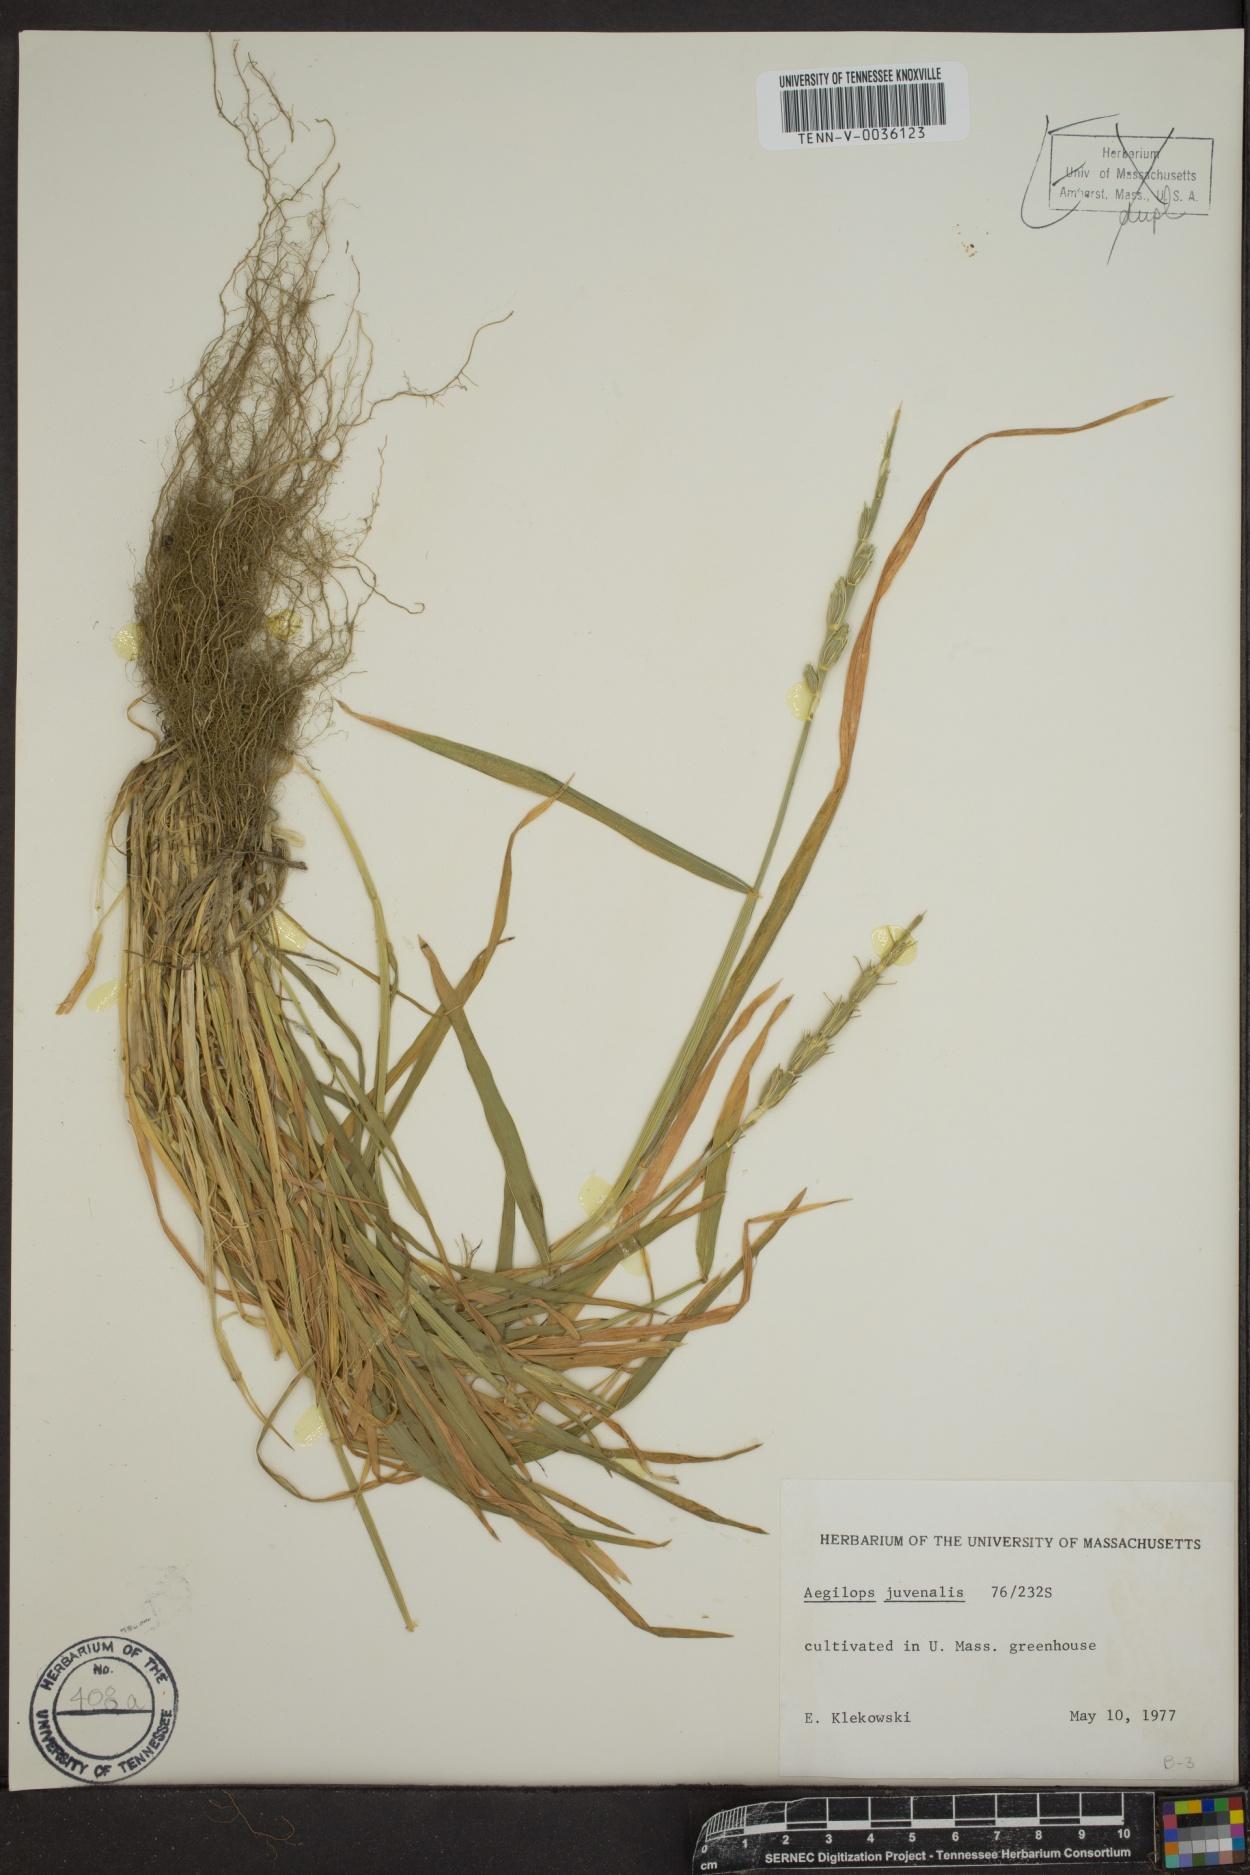 Aegilops juvenalis image